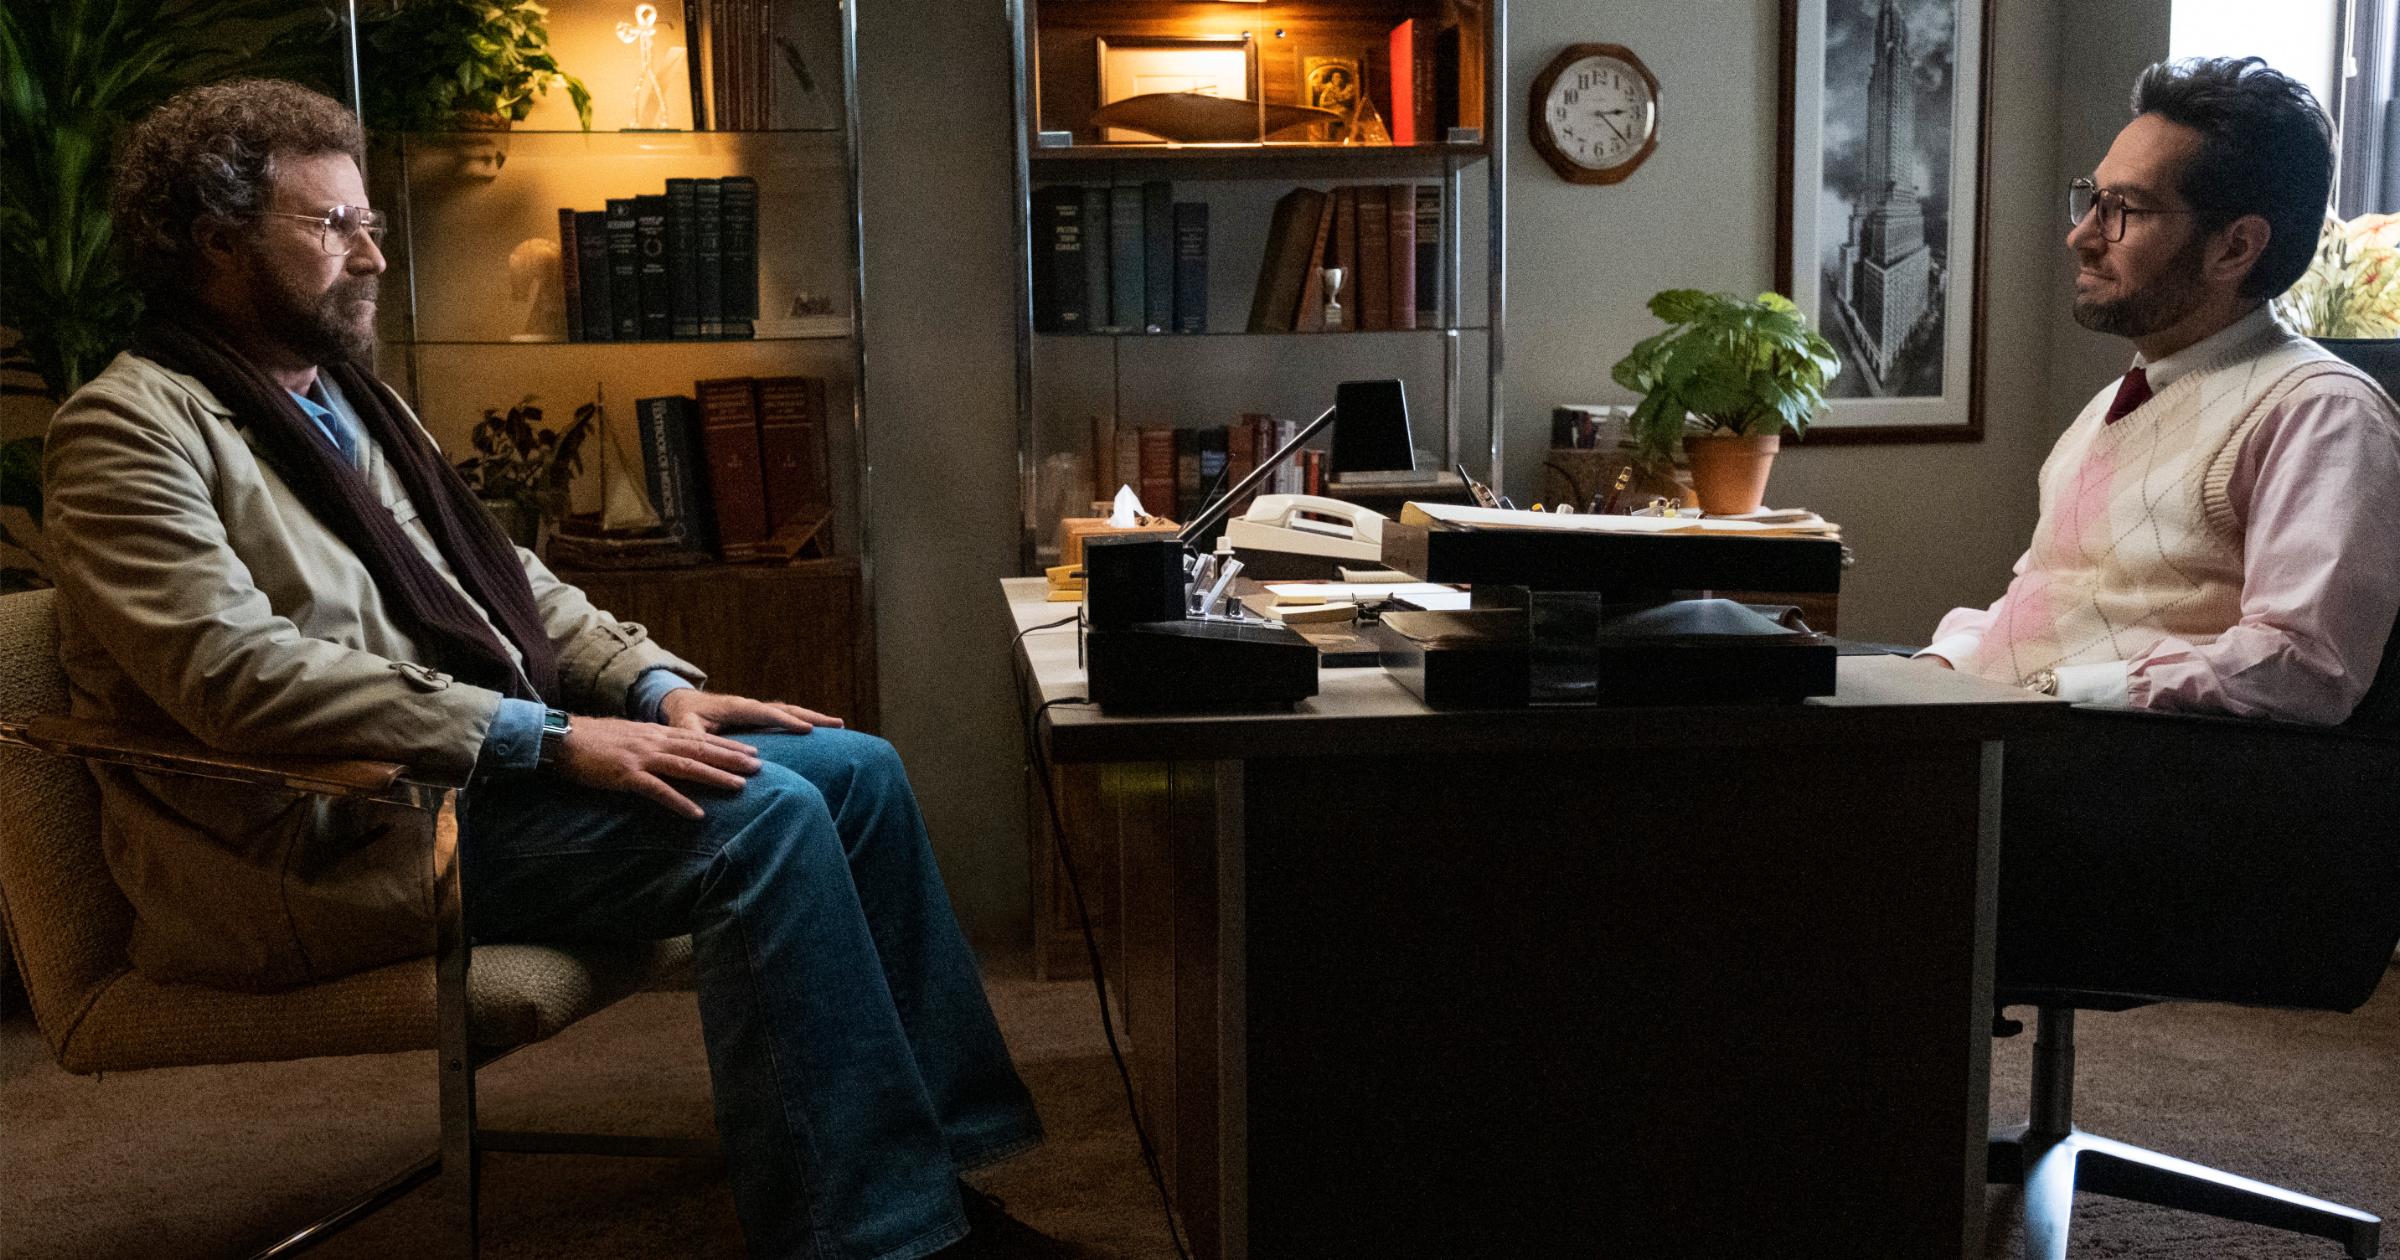 Paul Rudd and Will Ferrell in 'The Shrink Next Door' on Apple TV+